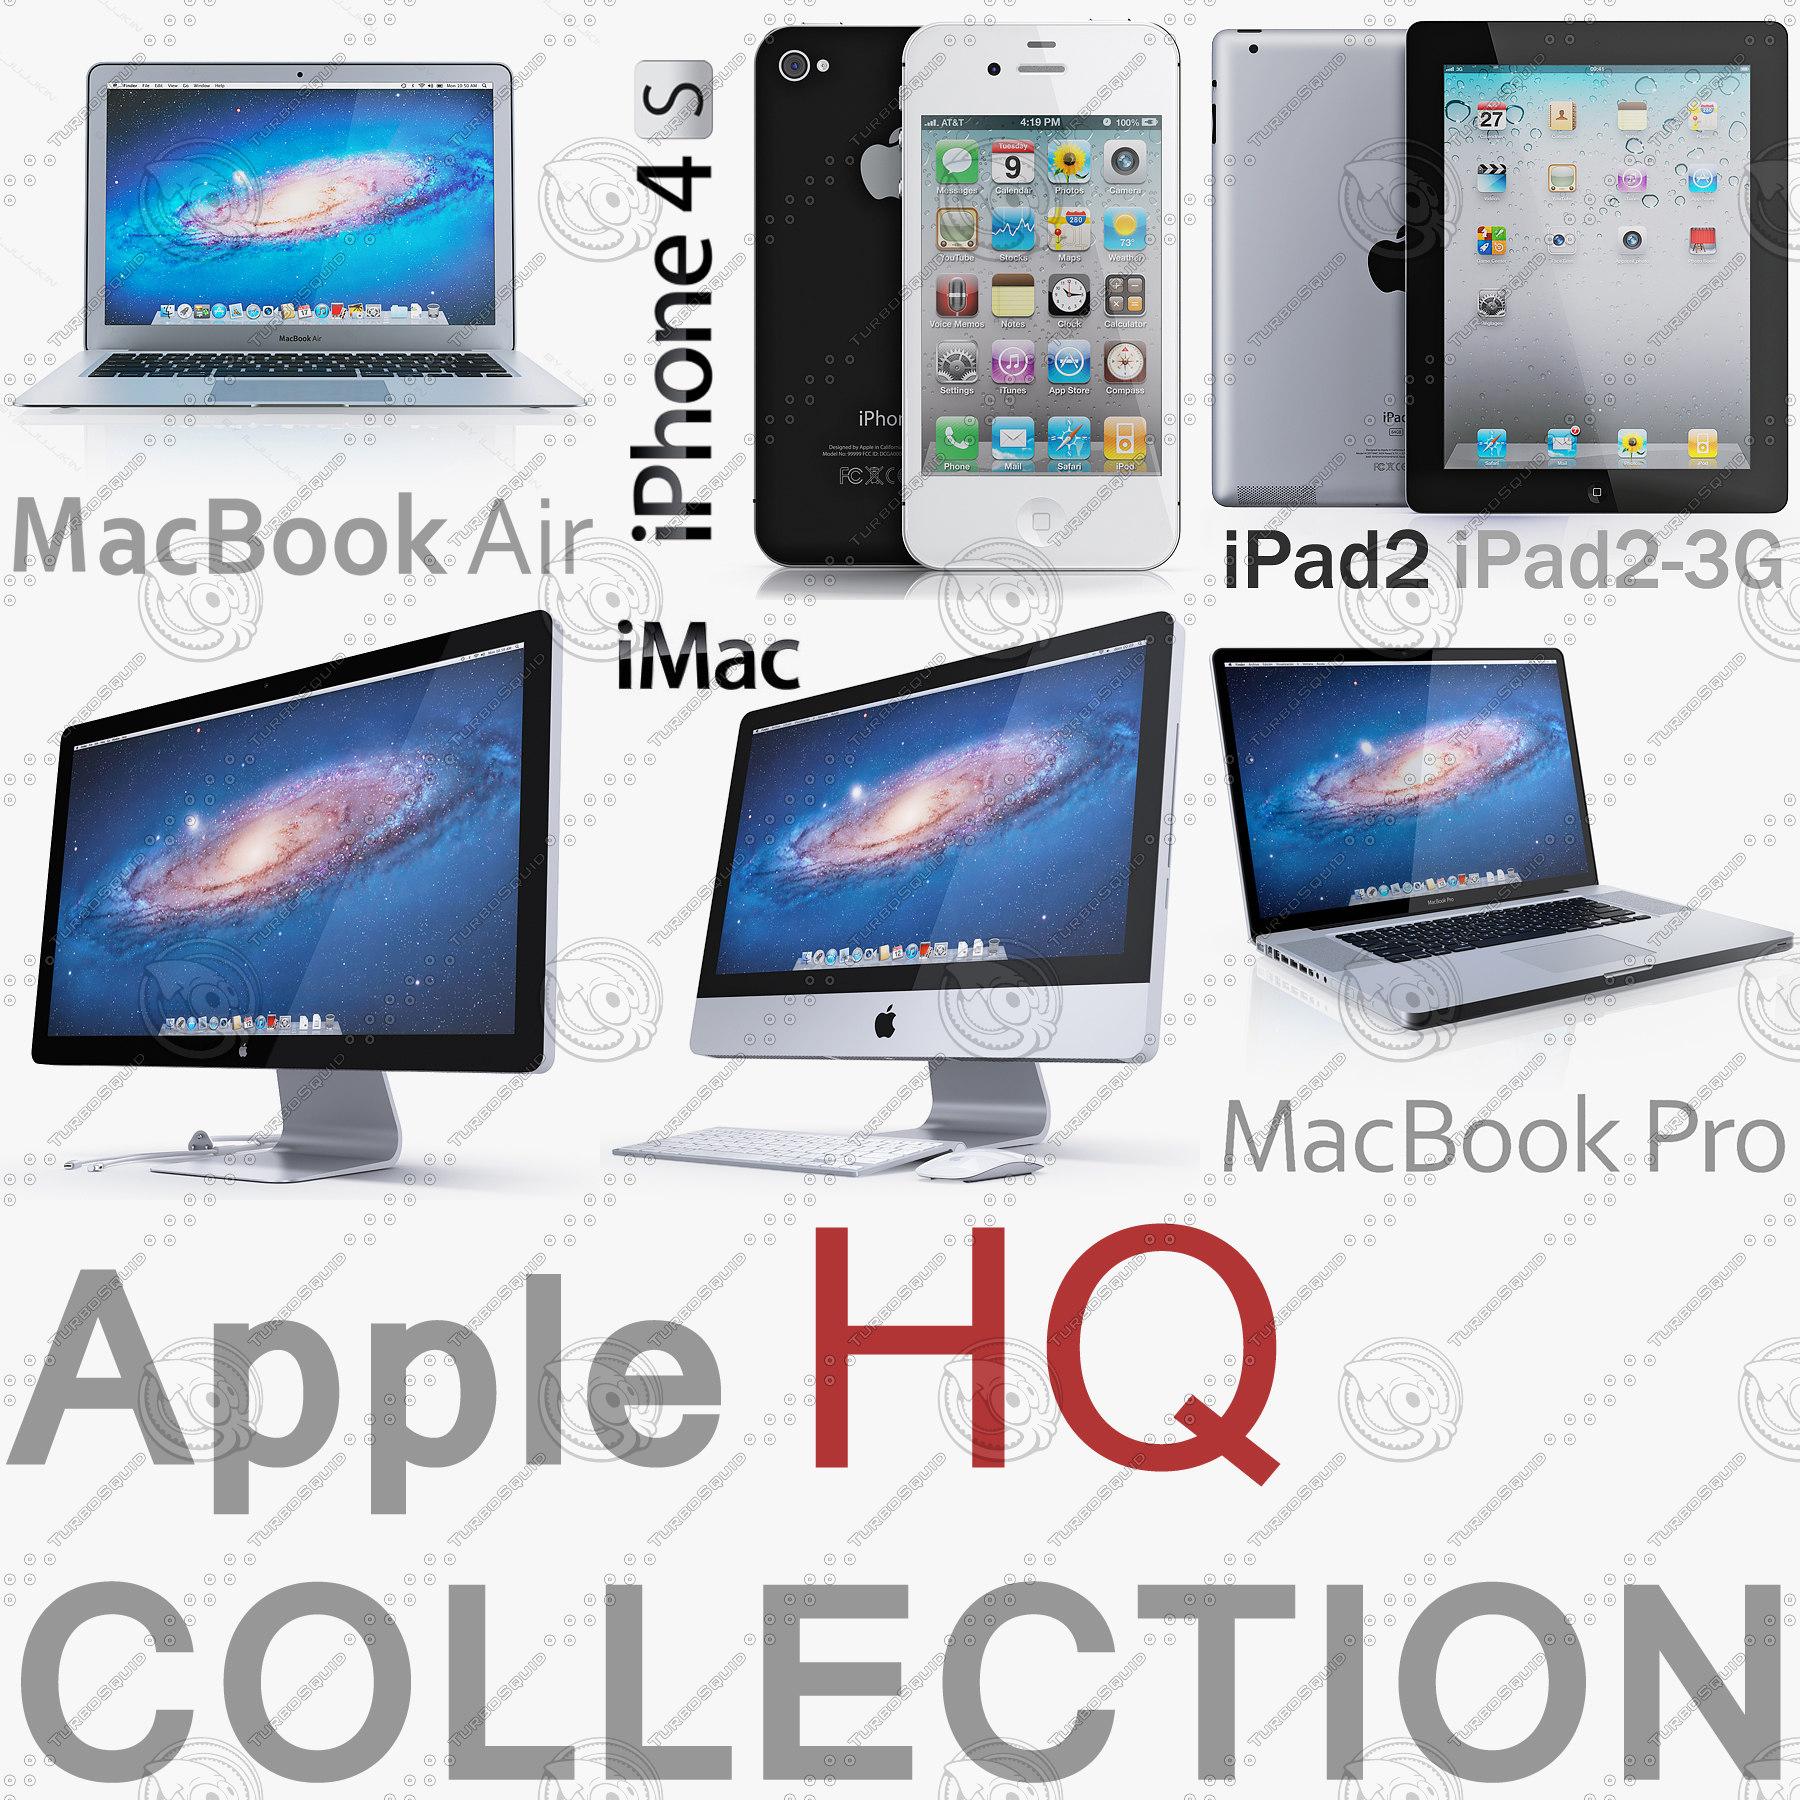 Apple_collection_01.jpg